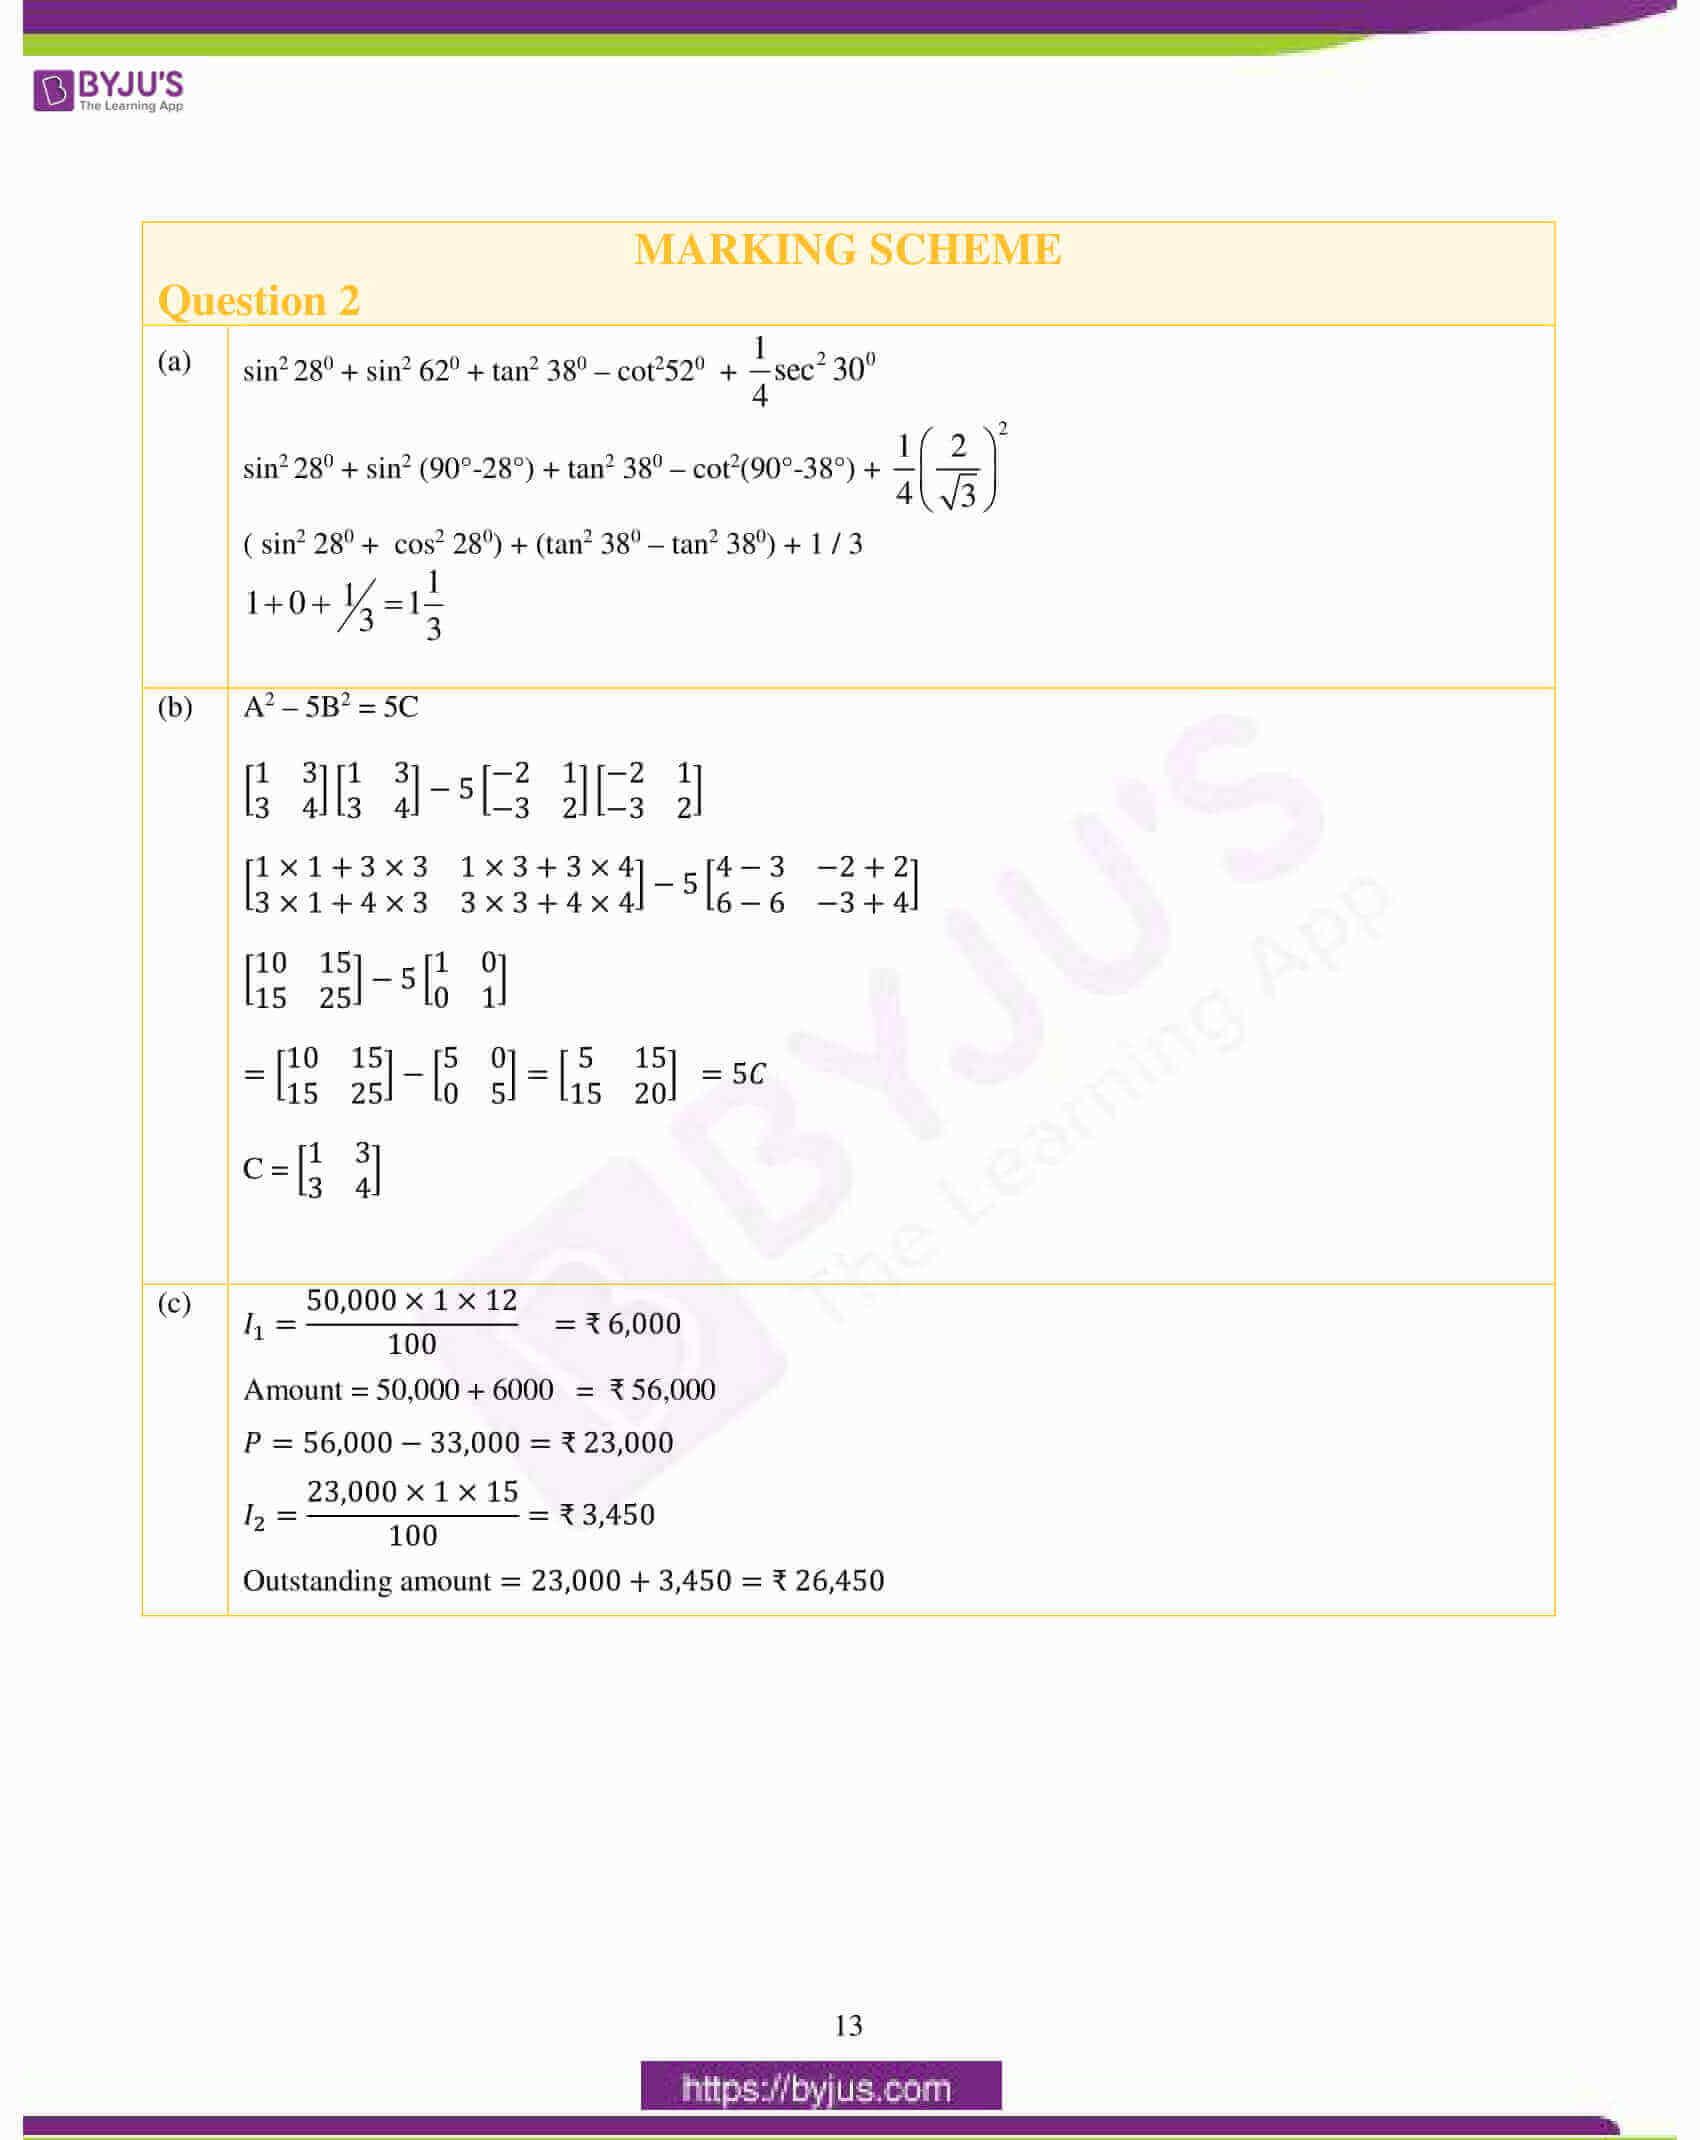 icse class 10 maths question paper solution 2017 04